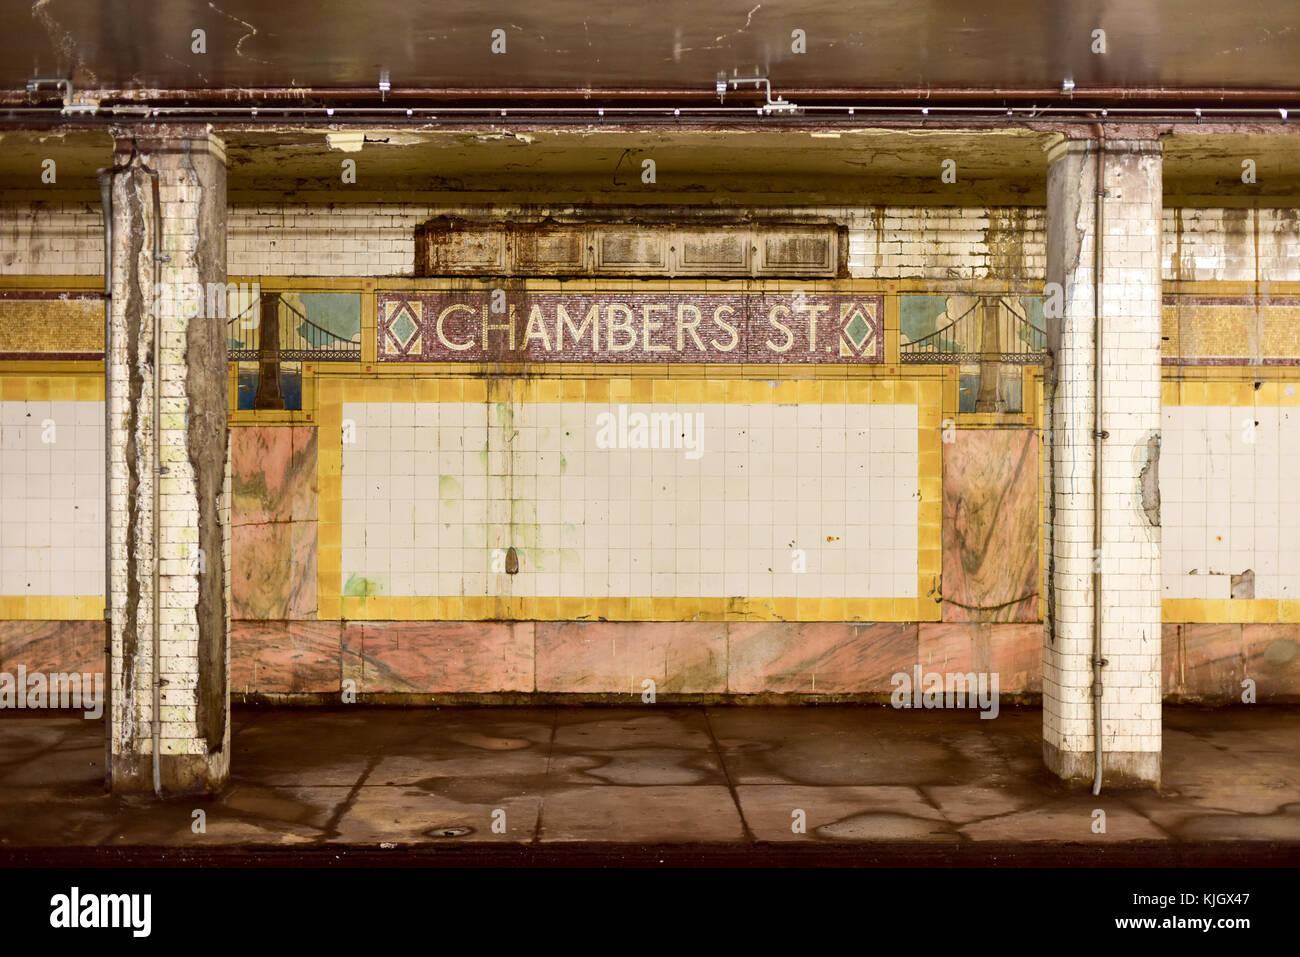 New york usa may 30 2015 chambers street subway station in new york usa may 30 2015 chambers street subway station in manhattan intricate tiles with symbols of the brooklyn bridge in terra cotta biocorpaavc Gallery